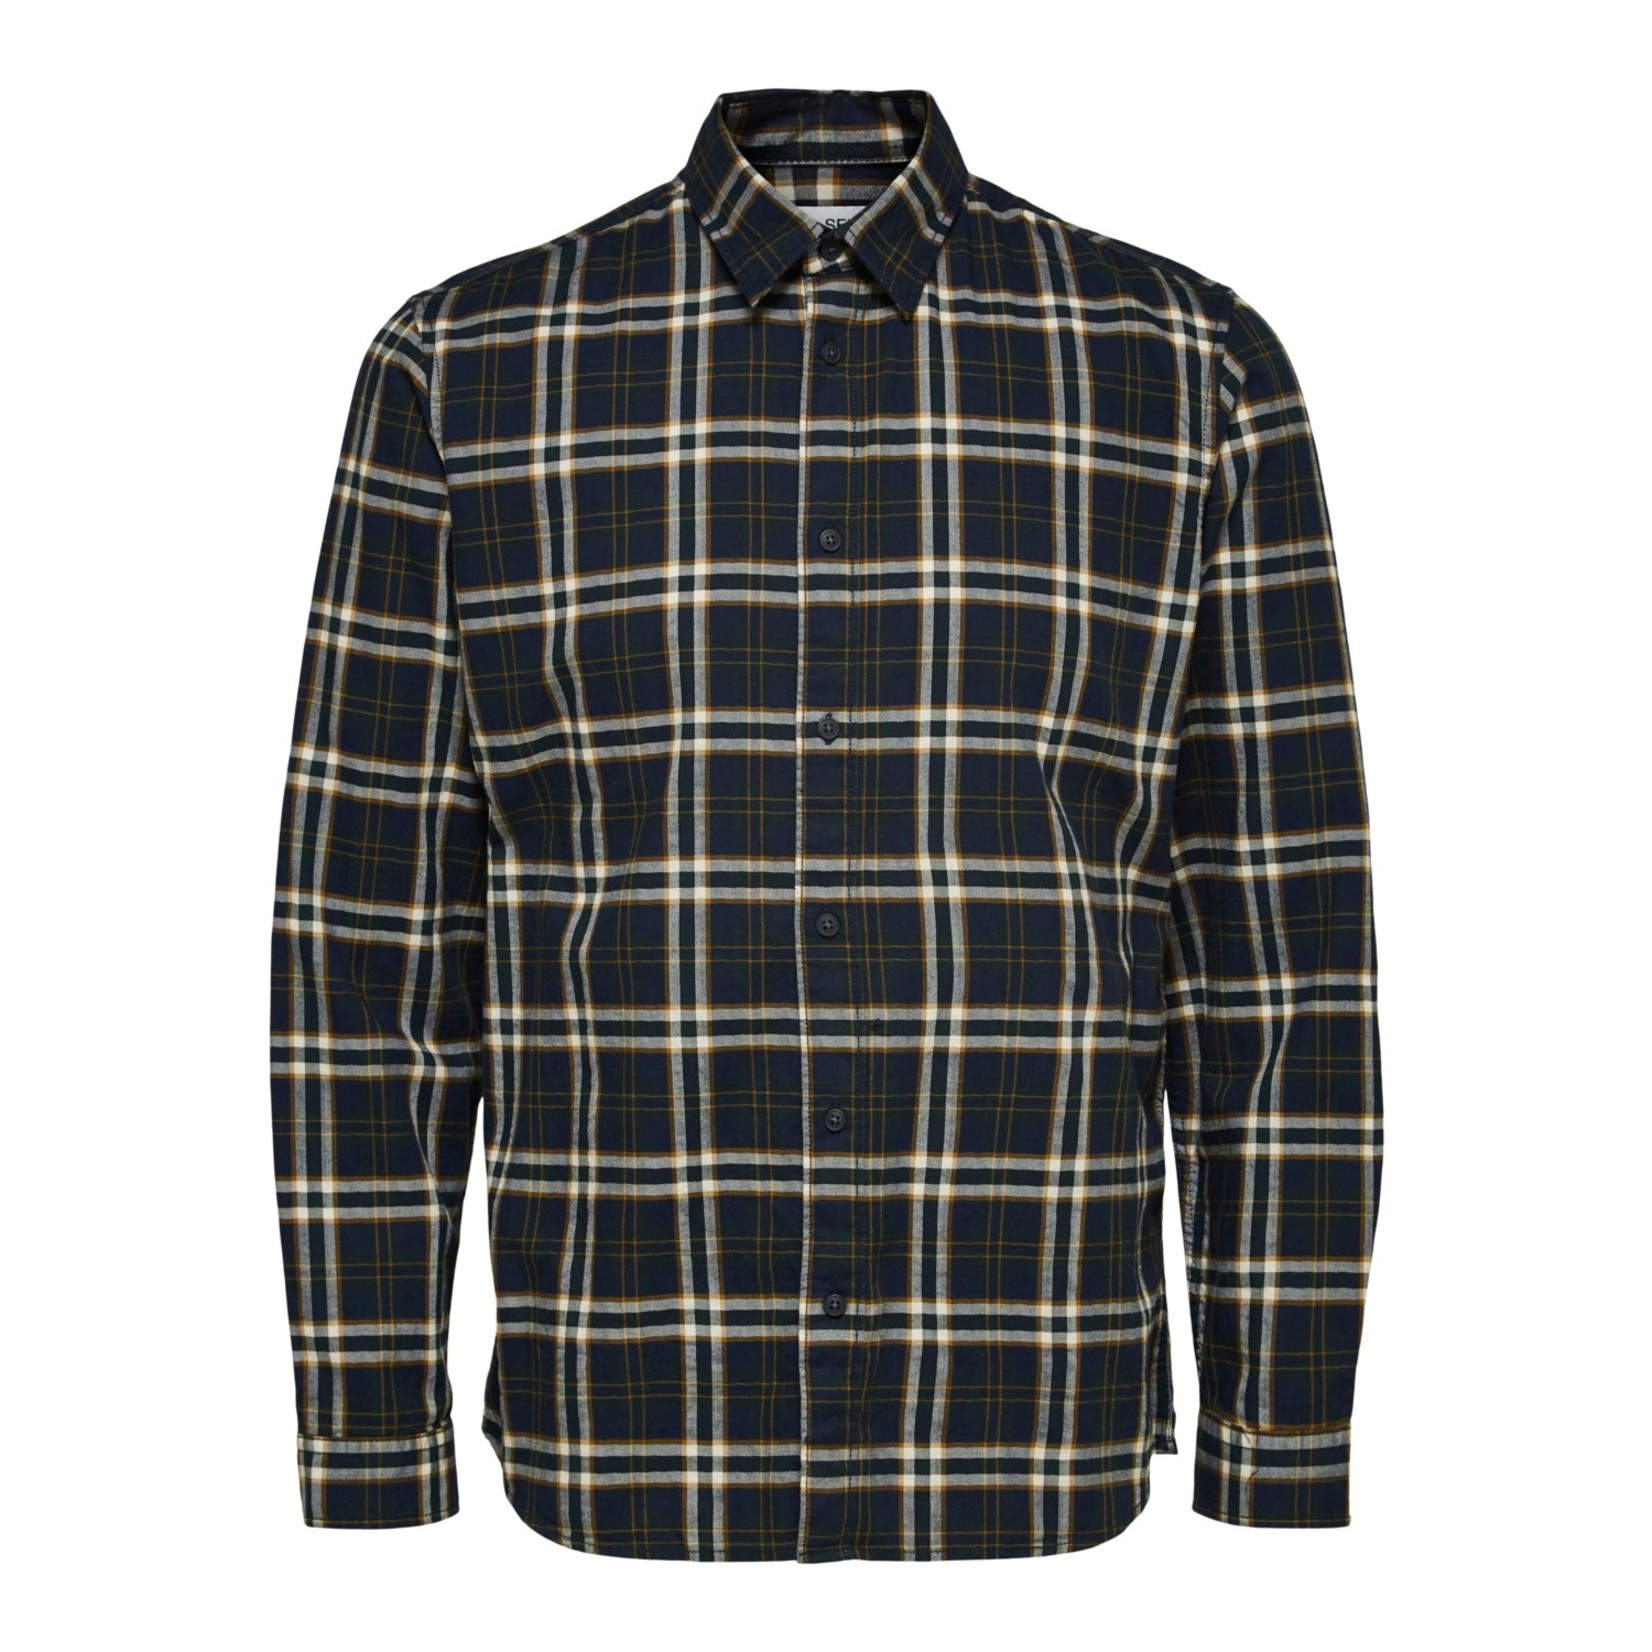 Selected Homme Selected 16082965 Trent Long-Sleeve Check Shirt - Dark Navy Checks